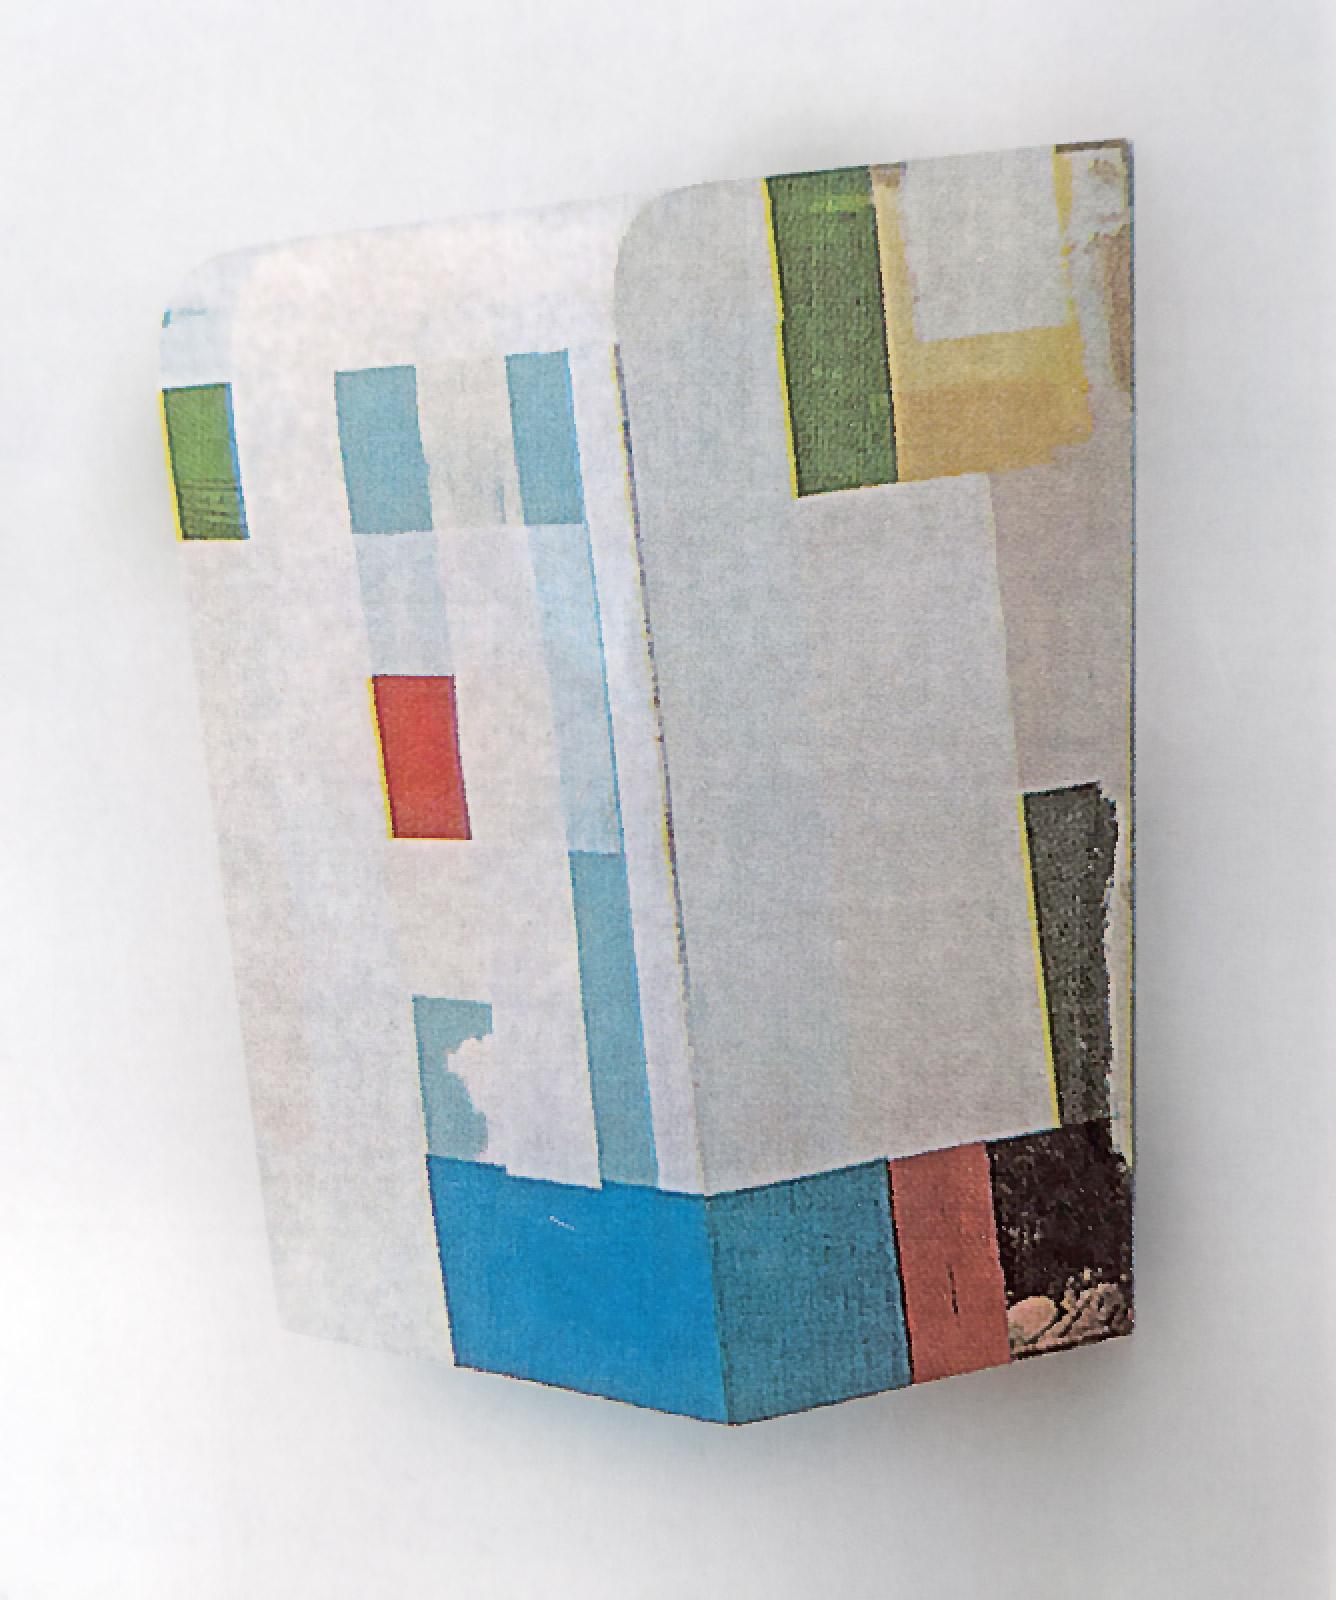 """Kunst-ist-kostbar-II"", 43x33x21 cm, Acryl, Holz"